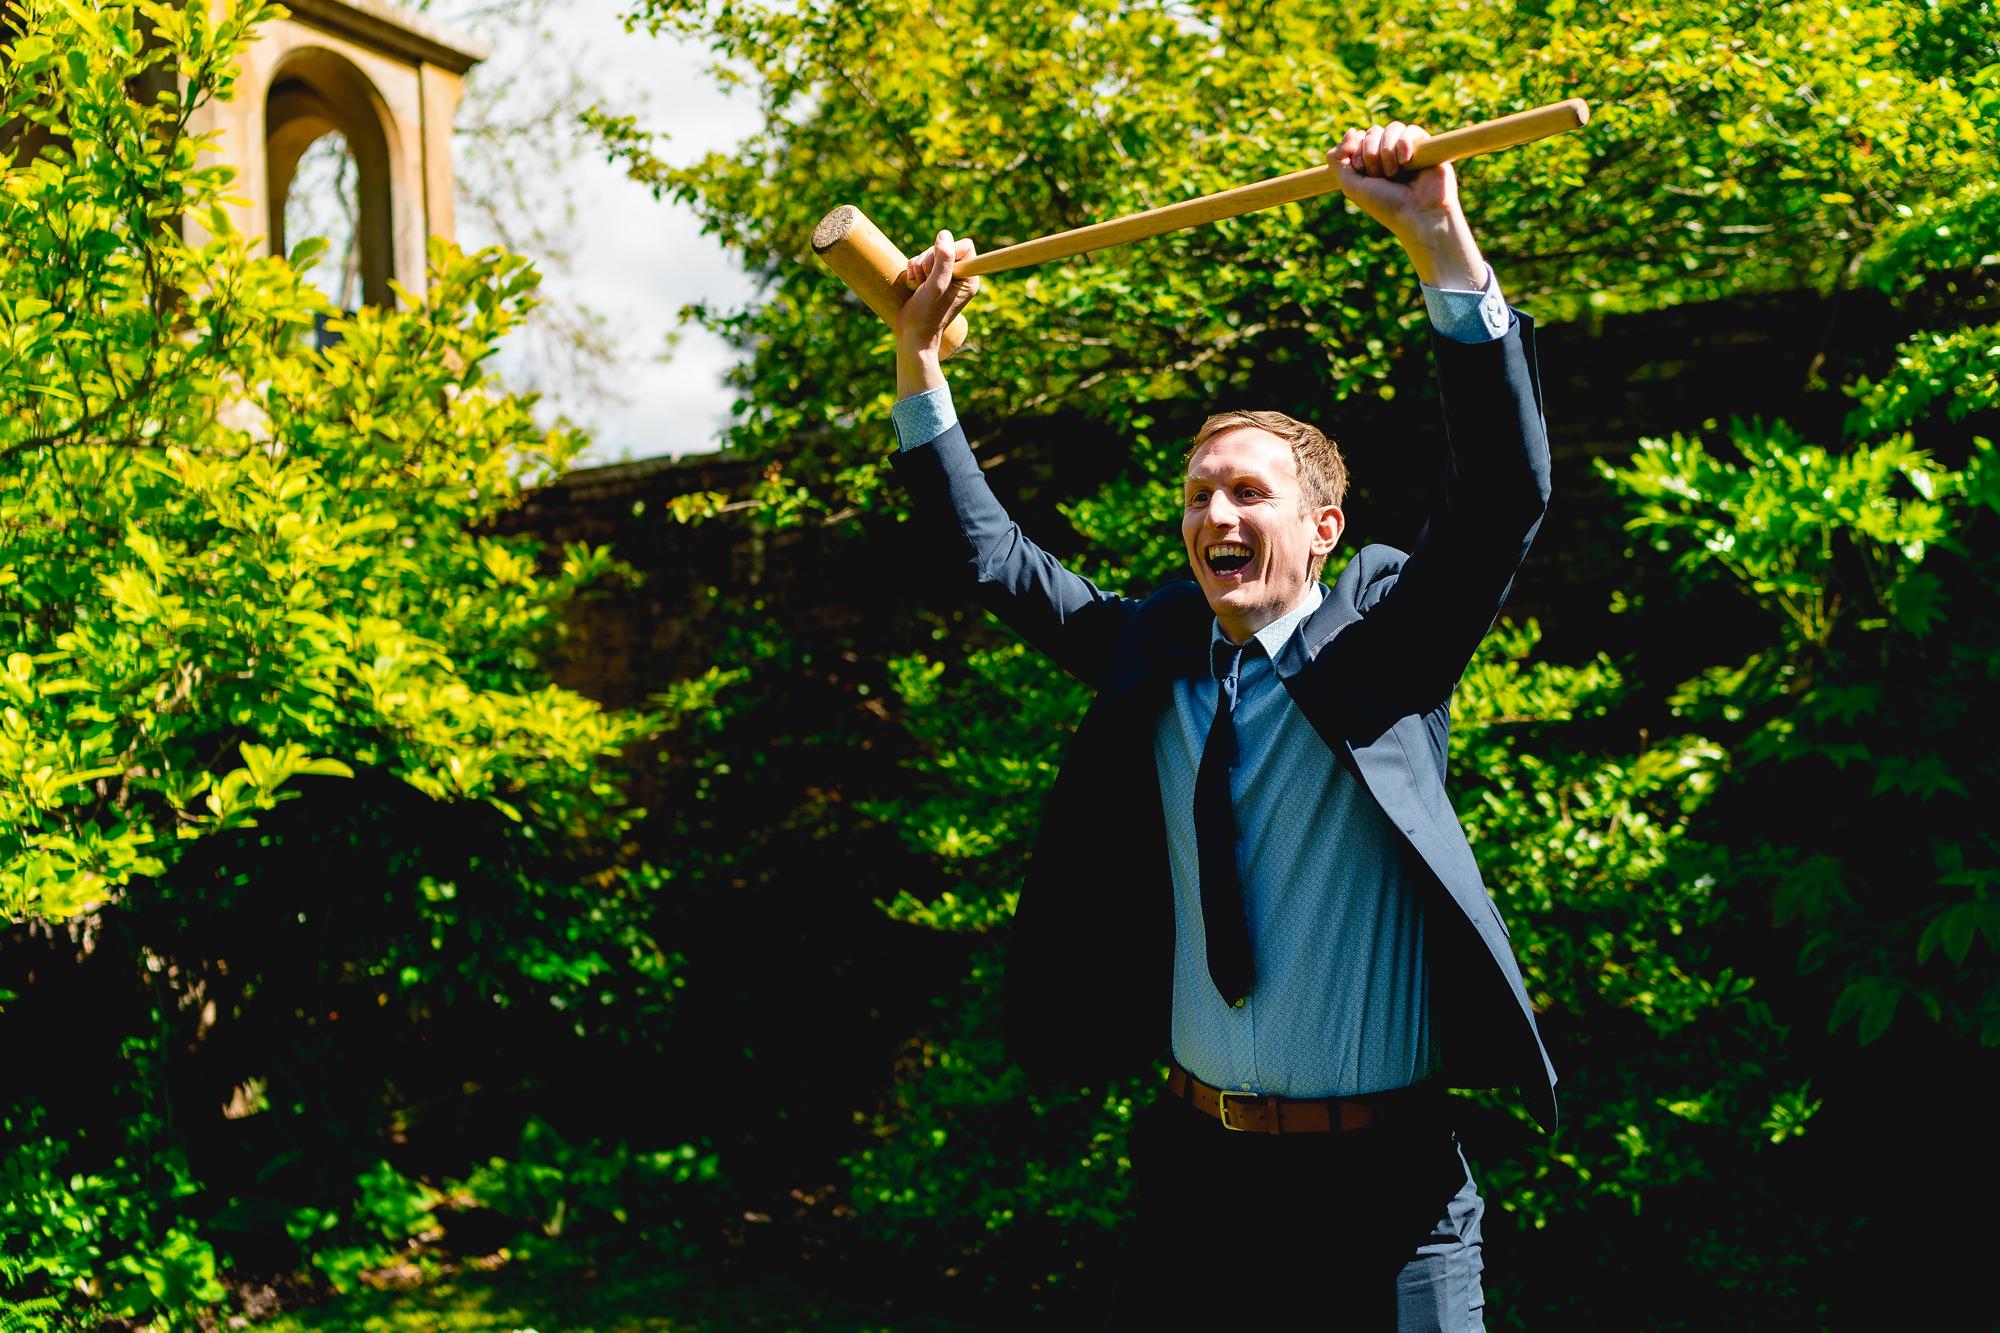 Soughton-Hall-Wedding-Photographer_0014.jpg